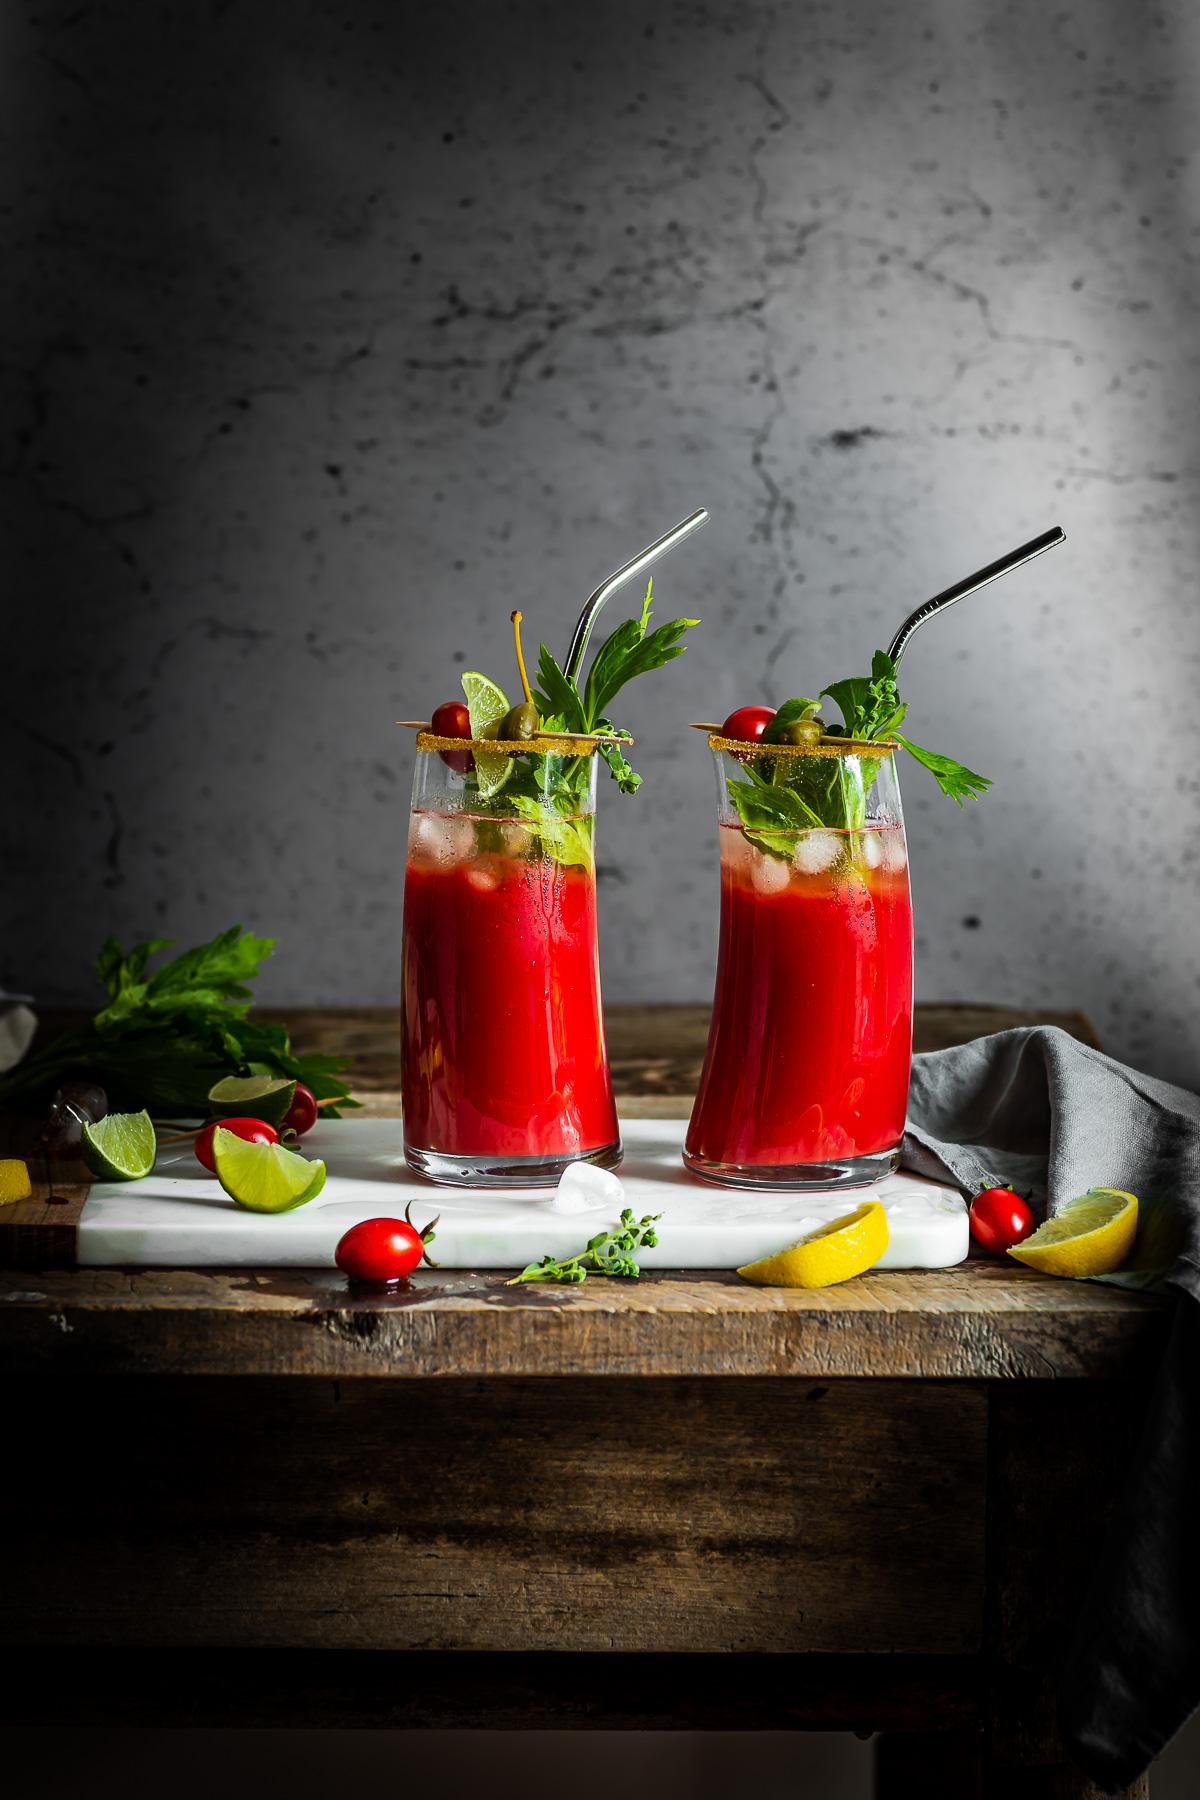 healthy Vegan Water Kefir NON-ALCOHOLIC BLOODY MARY recipe #cocktail ricetta Bloody Mary Analcolico al Kefir d acqua per brunch e festa sano rinfrescante succo di pomodoro